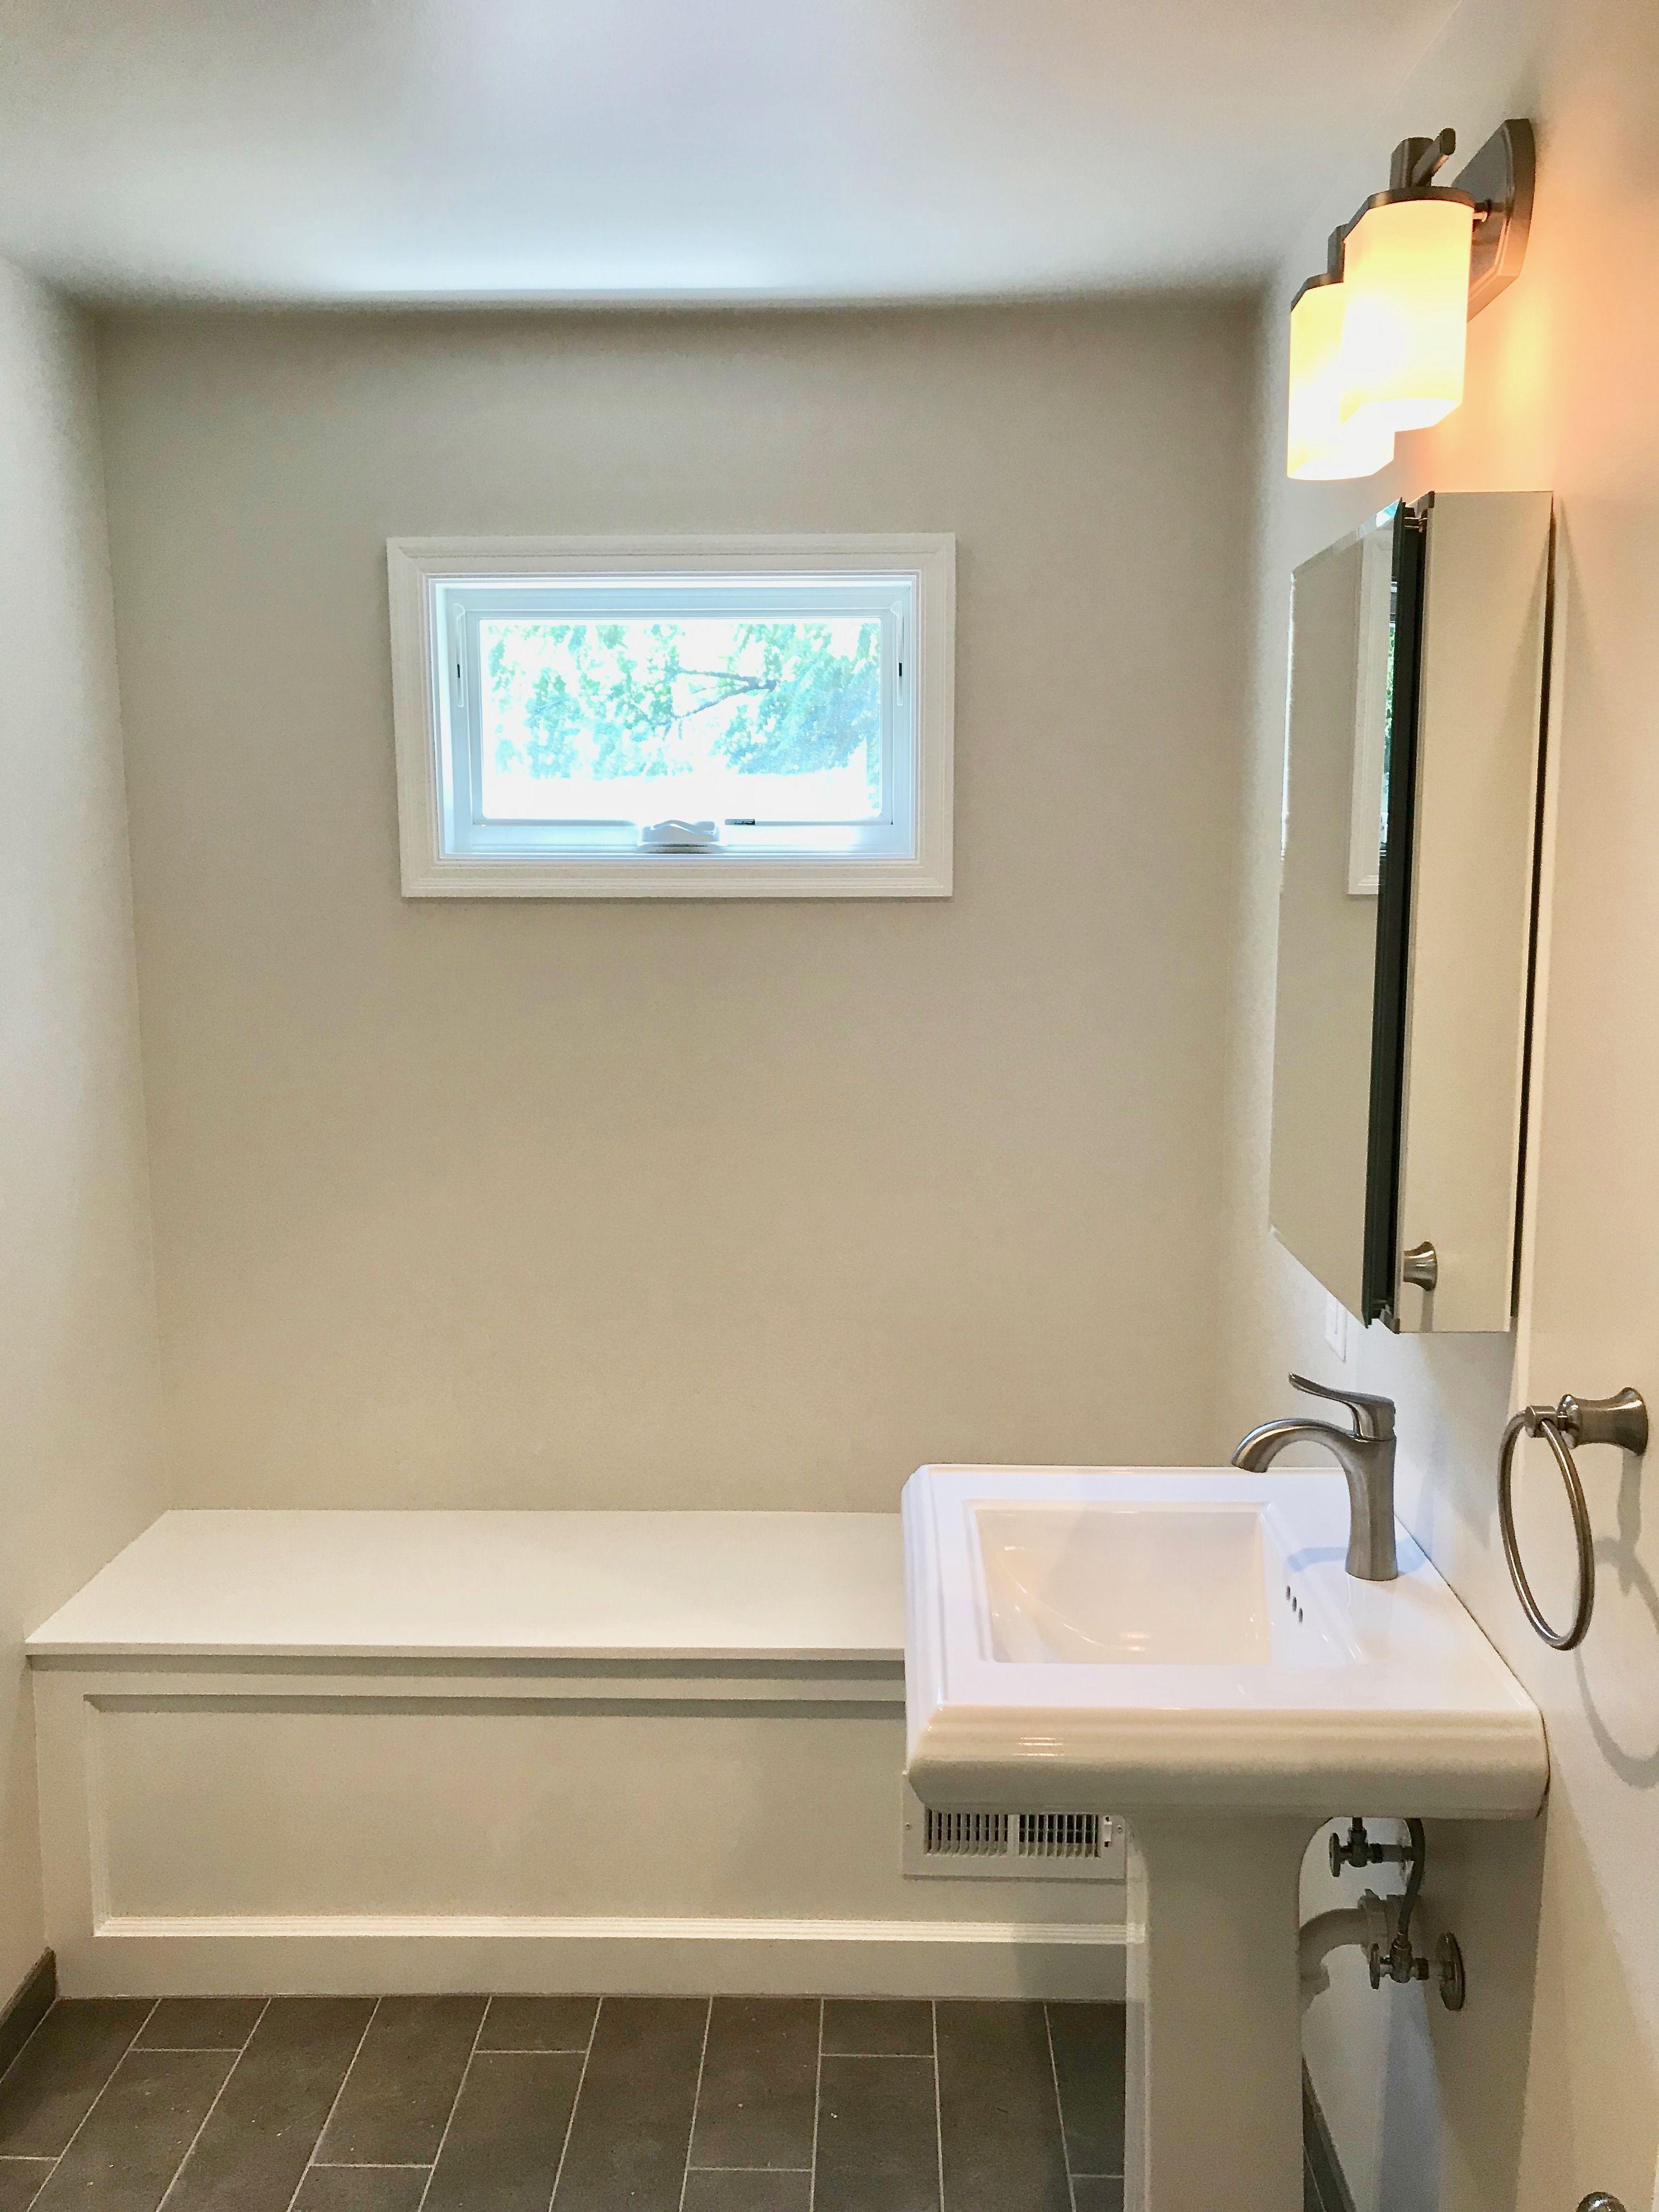 Kohler Memoirs 24 Pedestal Sink With Mirabelle Provincetown Single